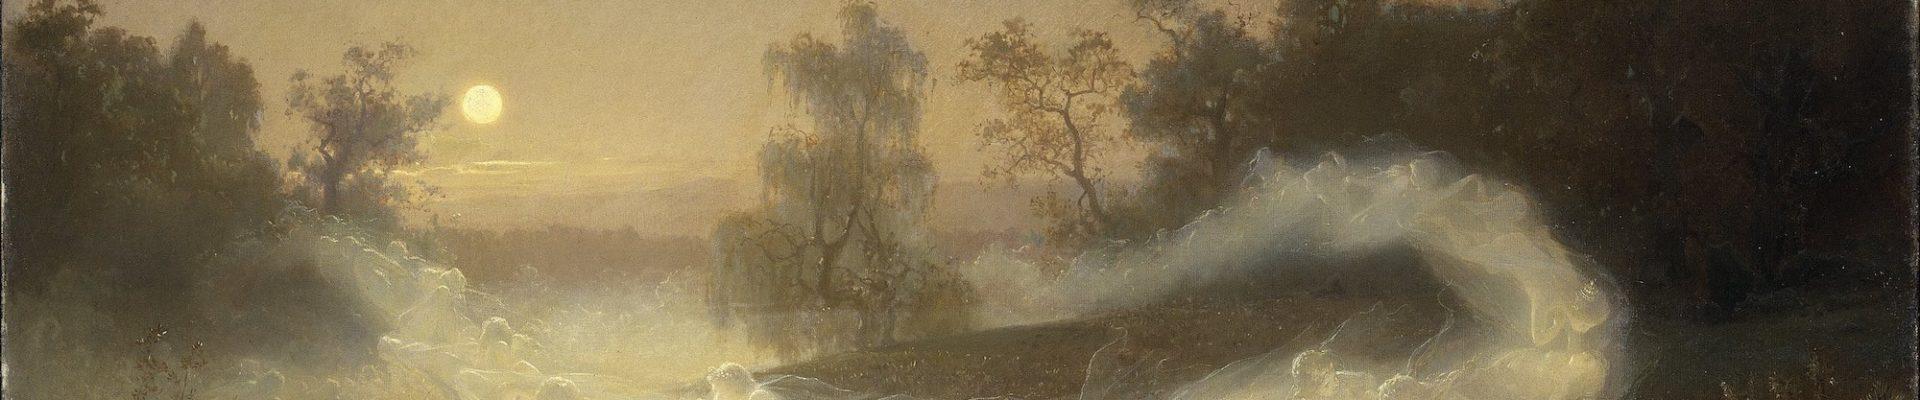 August Malmström, Dancing Faeries, 1866.